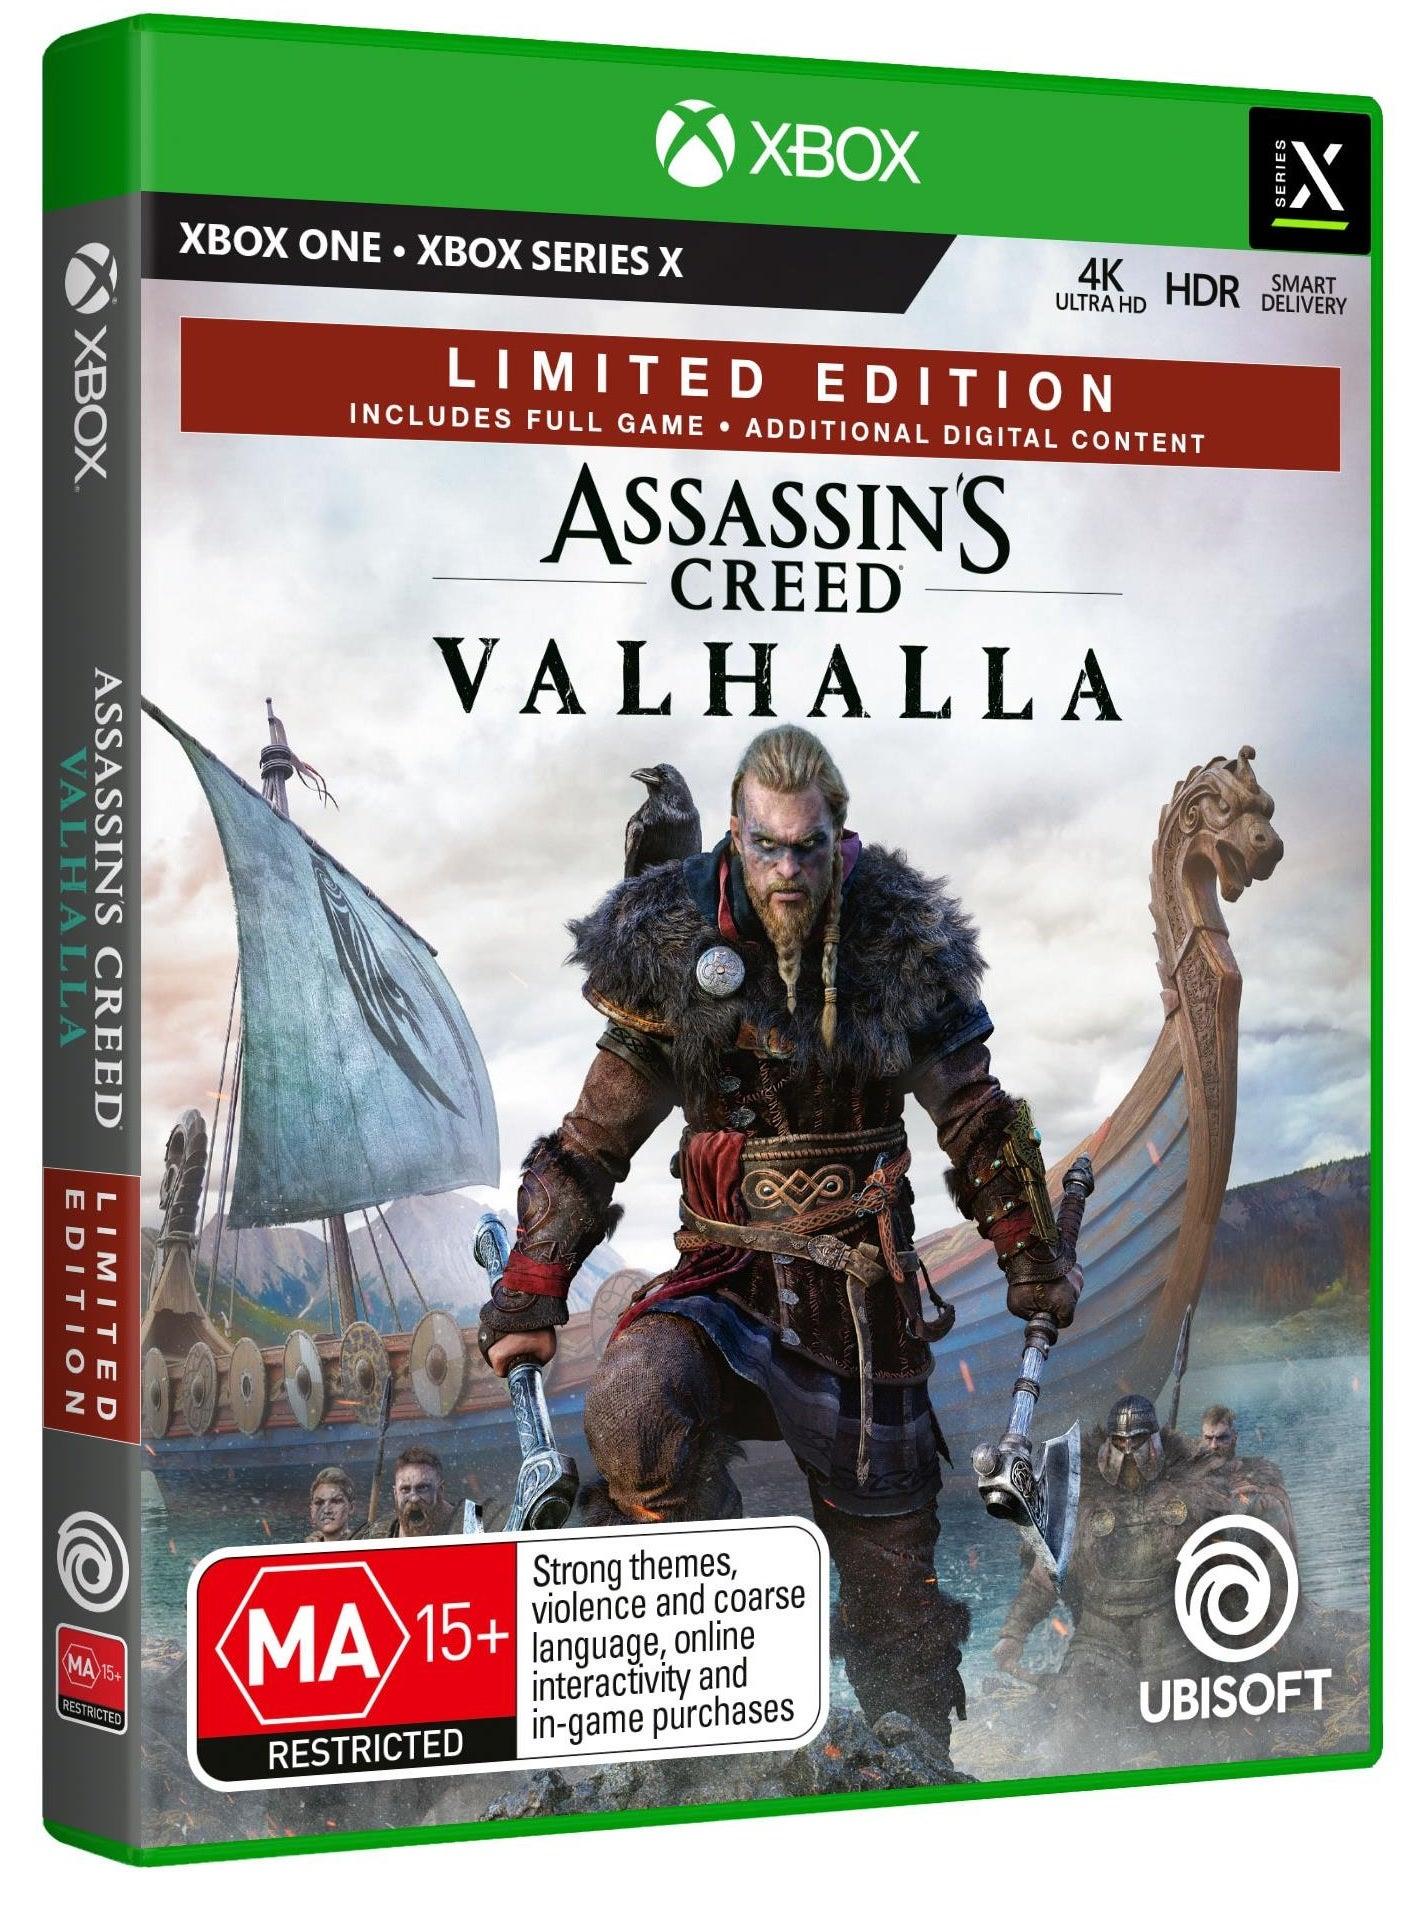 Ubisoft Assassins Creed Valhalla Limited Edition Xbox Series X Game